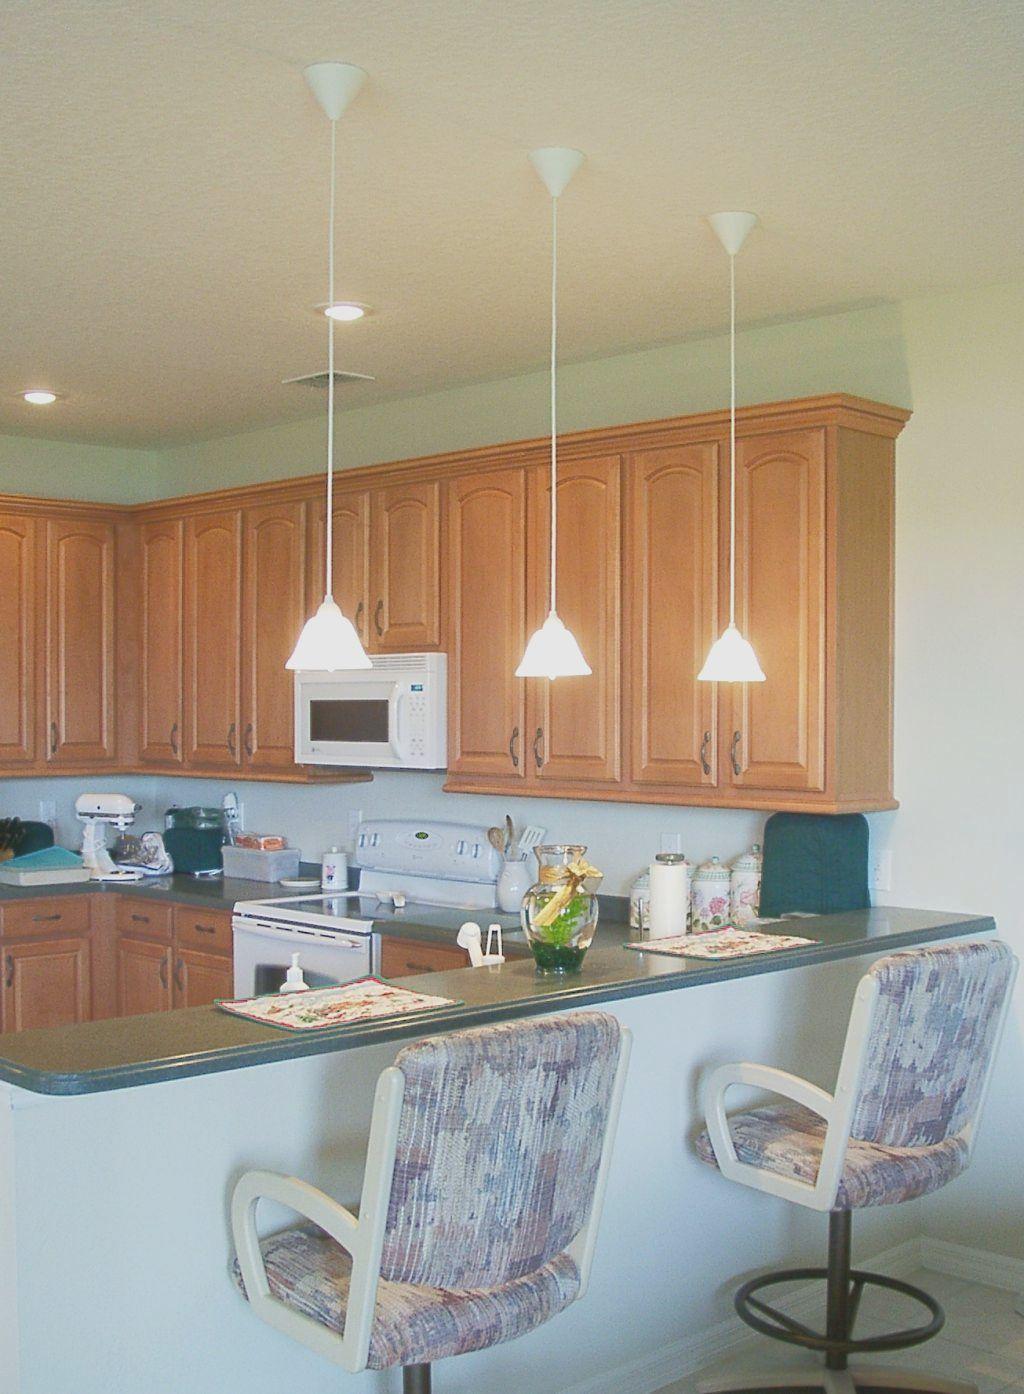 7 Best Kitchen Lighting Ideas Modern Light Fixtures For Home Bedroom Lighting Design Contemporary Kitchen Kitchen Bar Lights Pendant